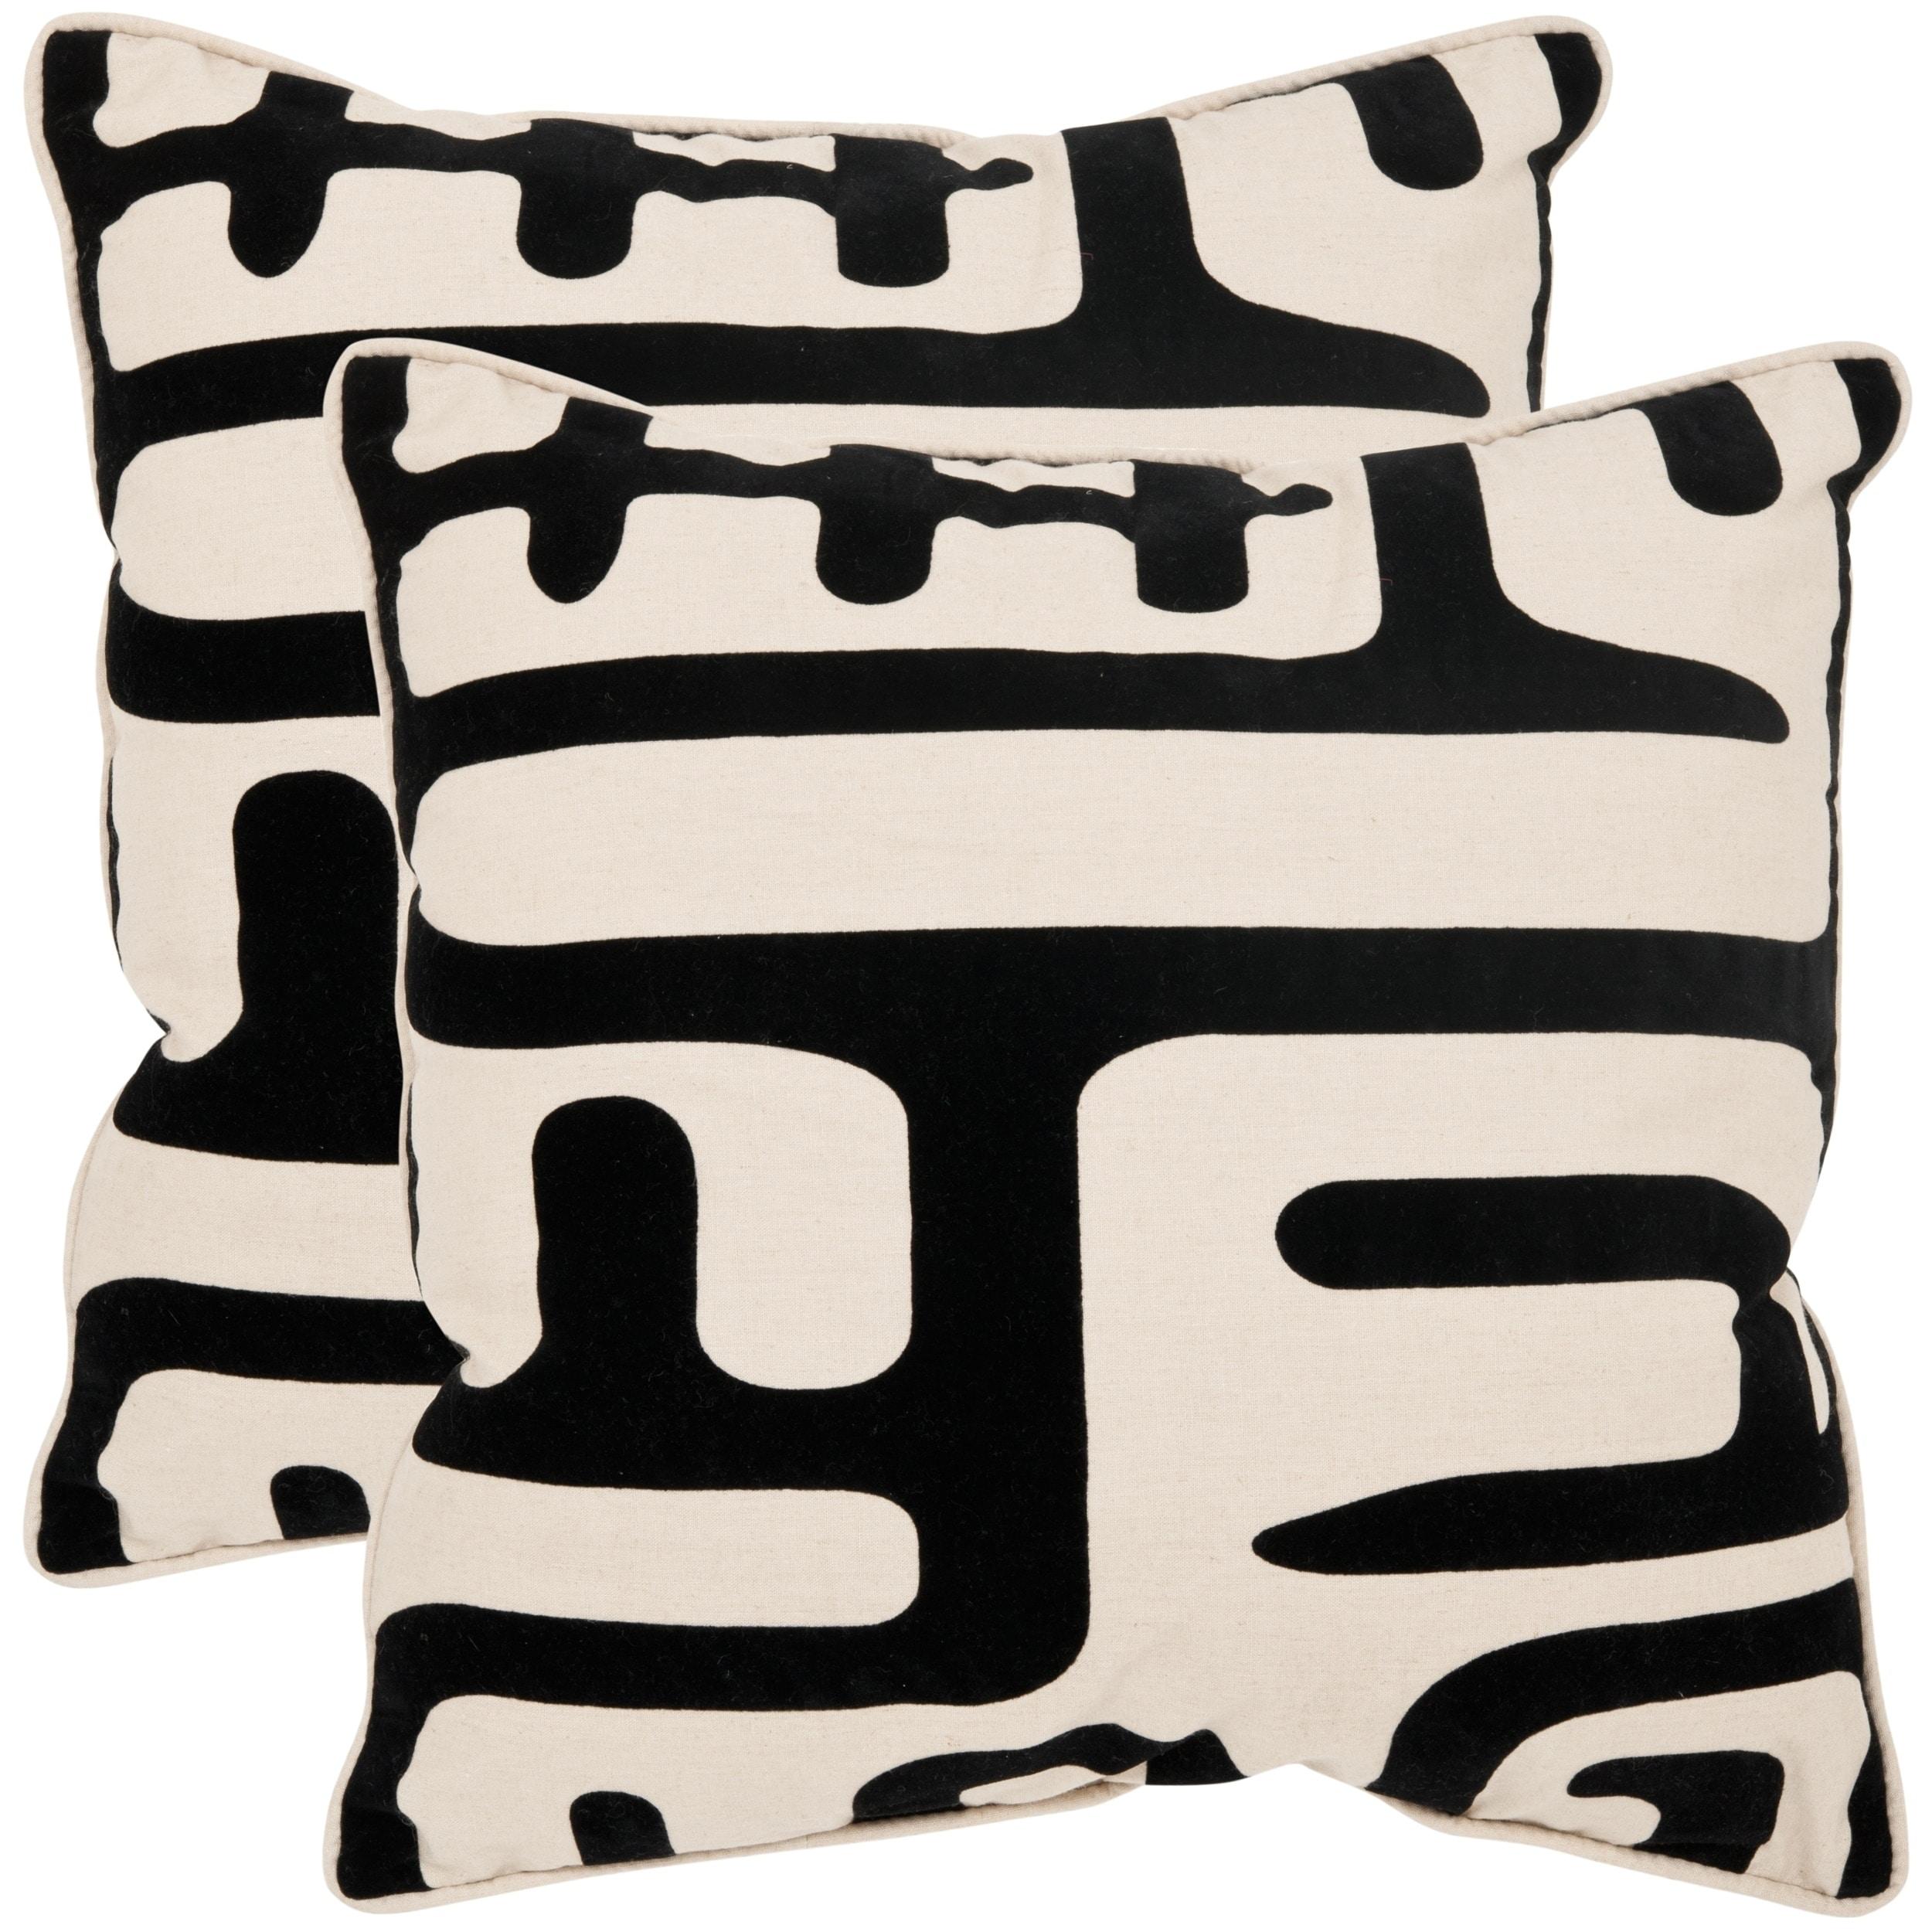 Safavieh Maize 22 Inch Ivory Black Decorative Pillows Set Of 2